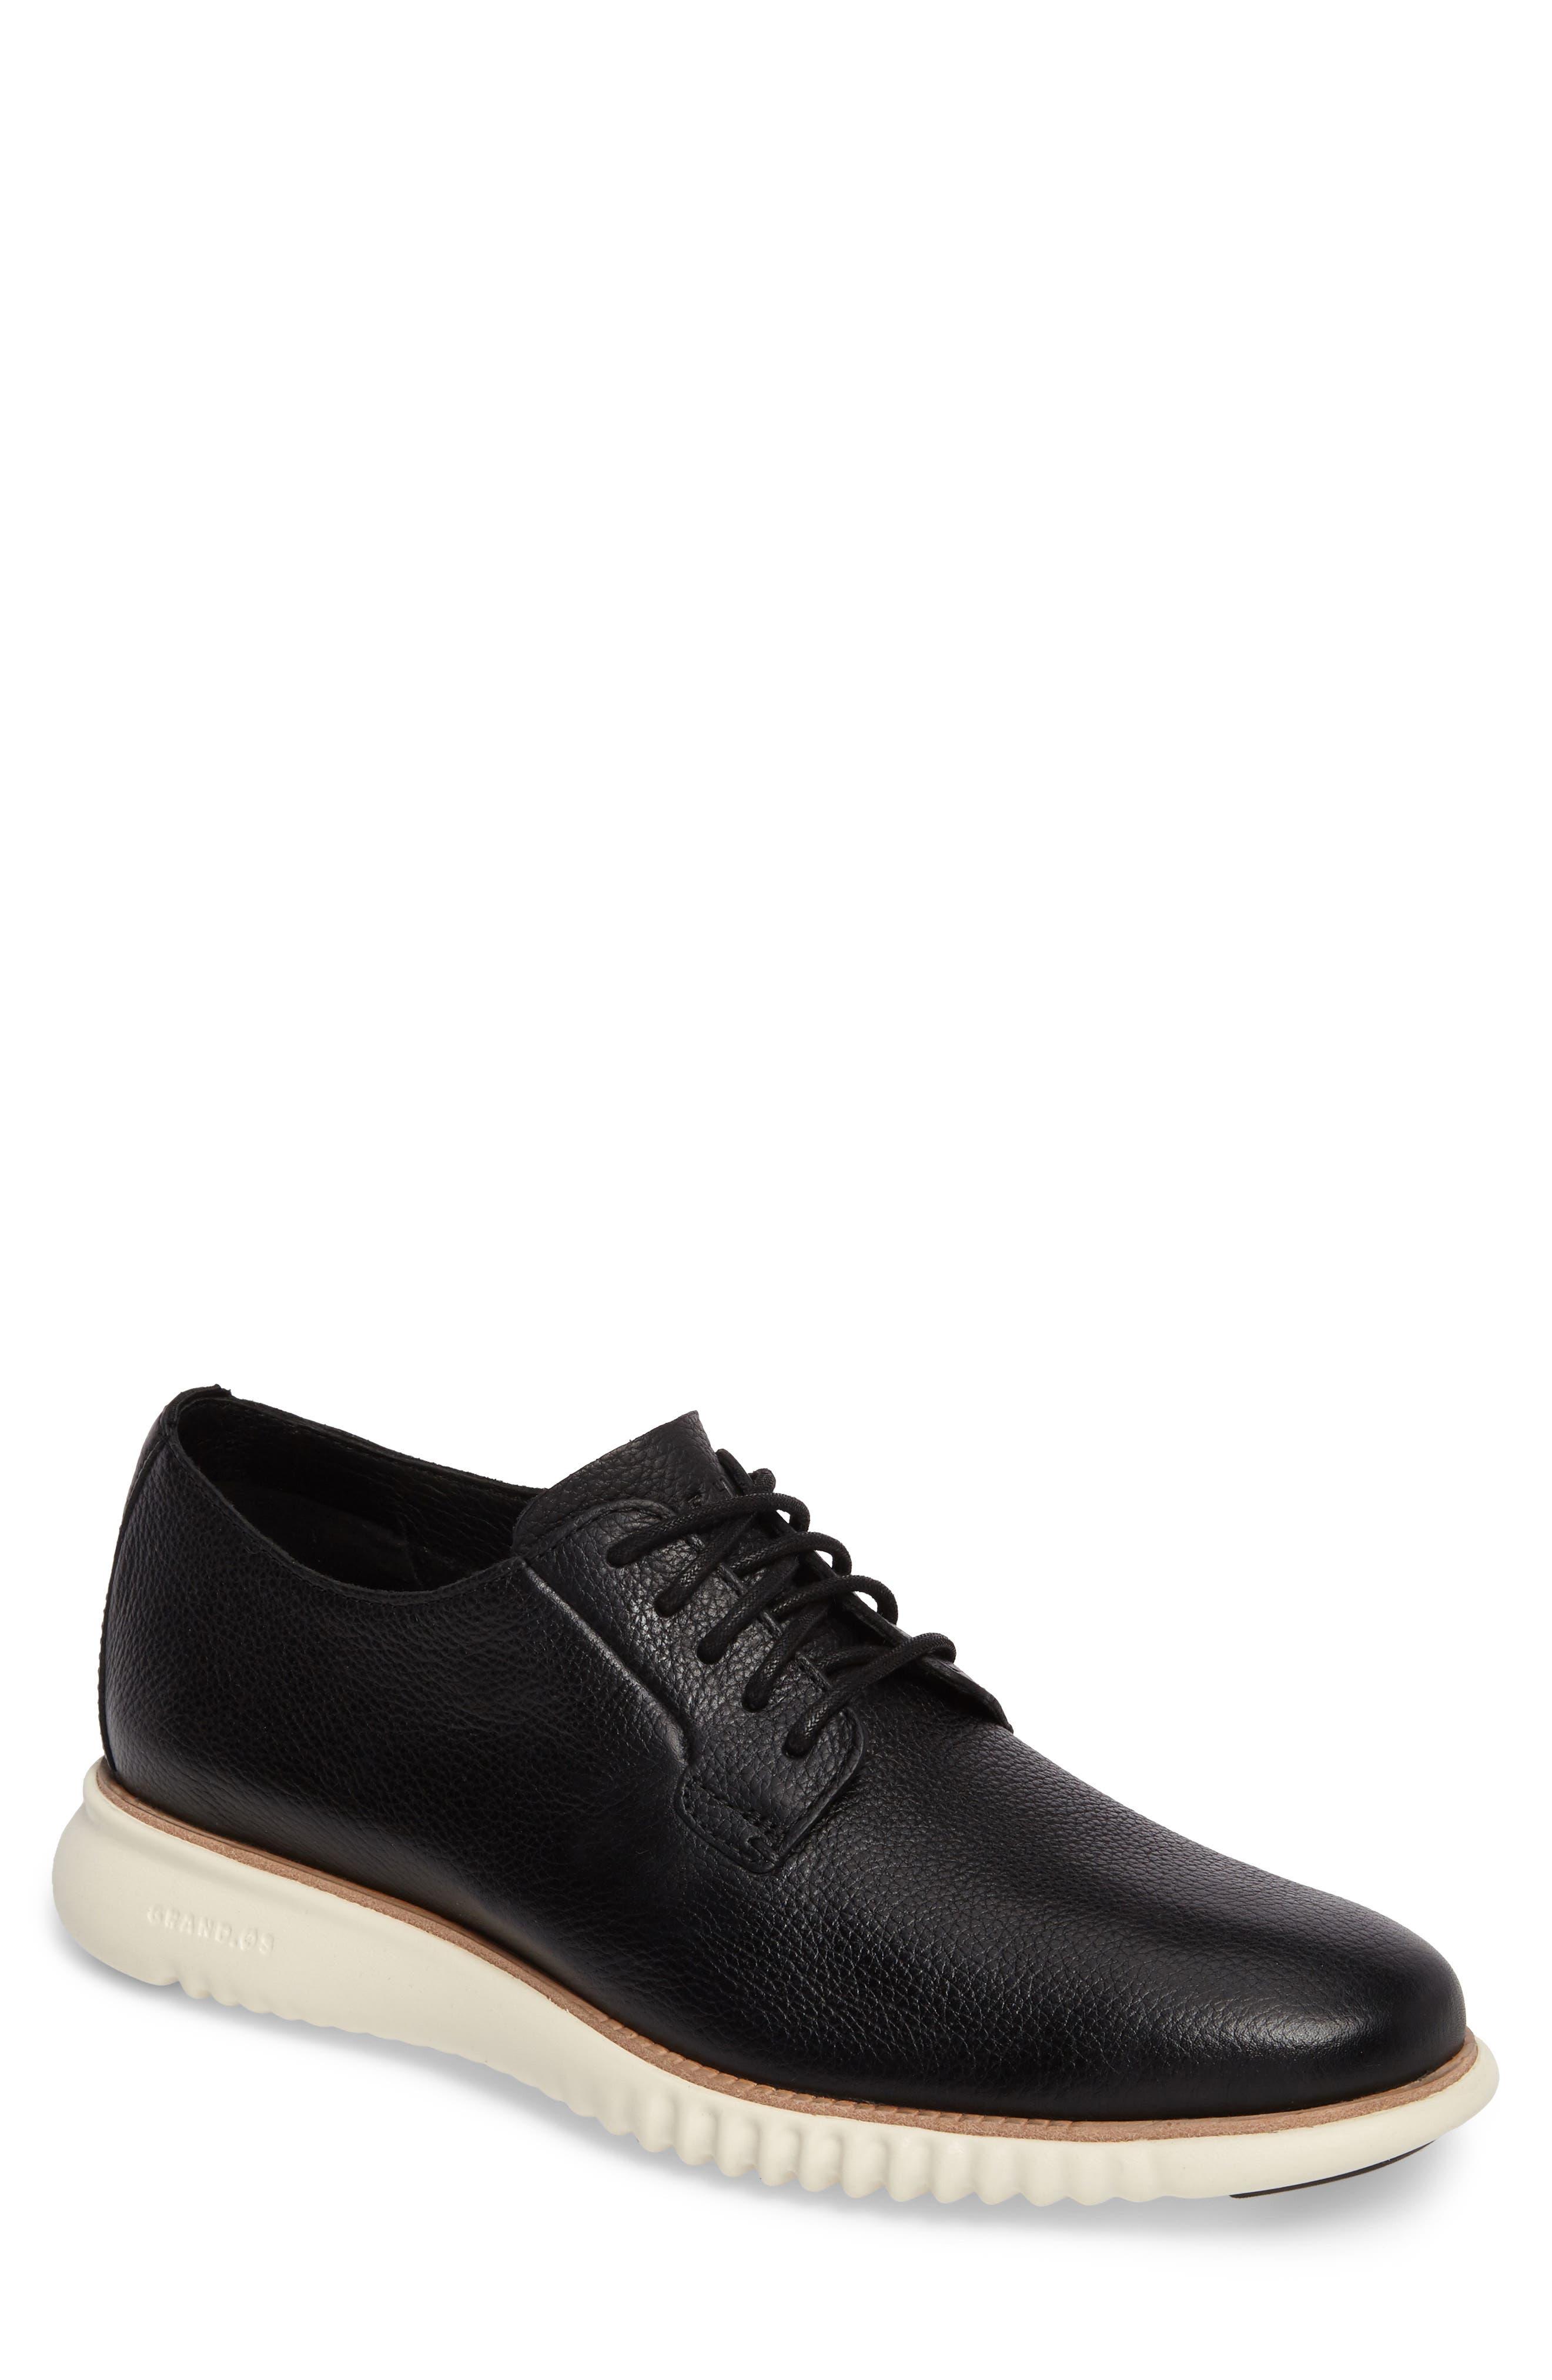 2.ZeroGrand Plain Toe Derby,                         Main,                         color, Black/ Ivory Leather